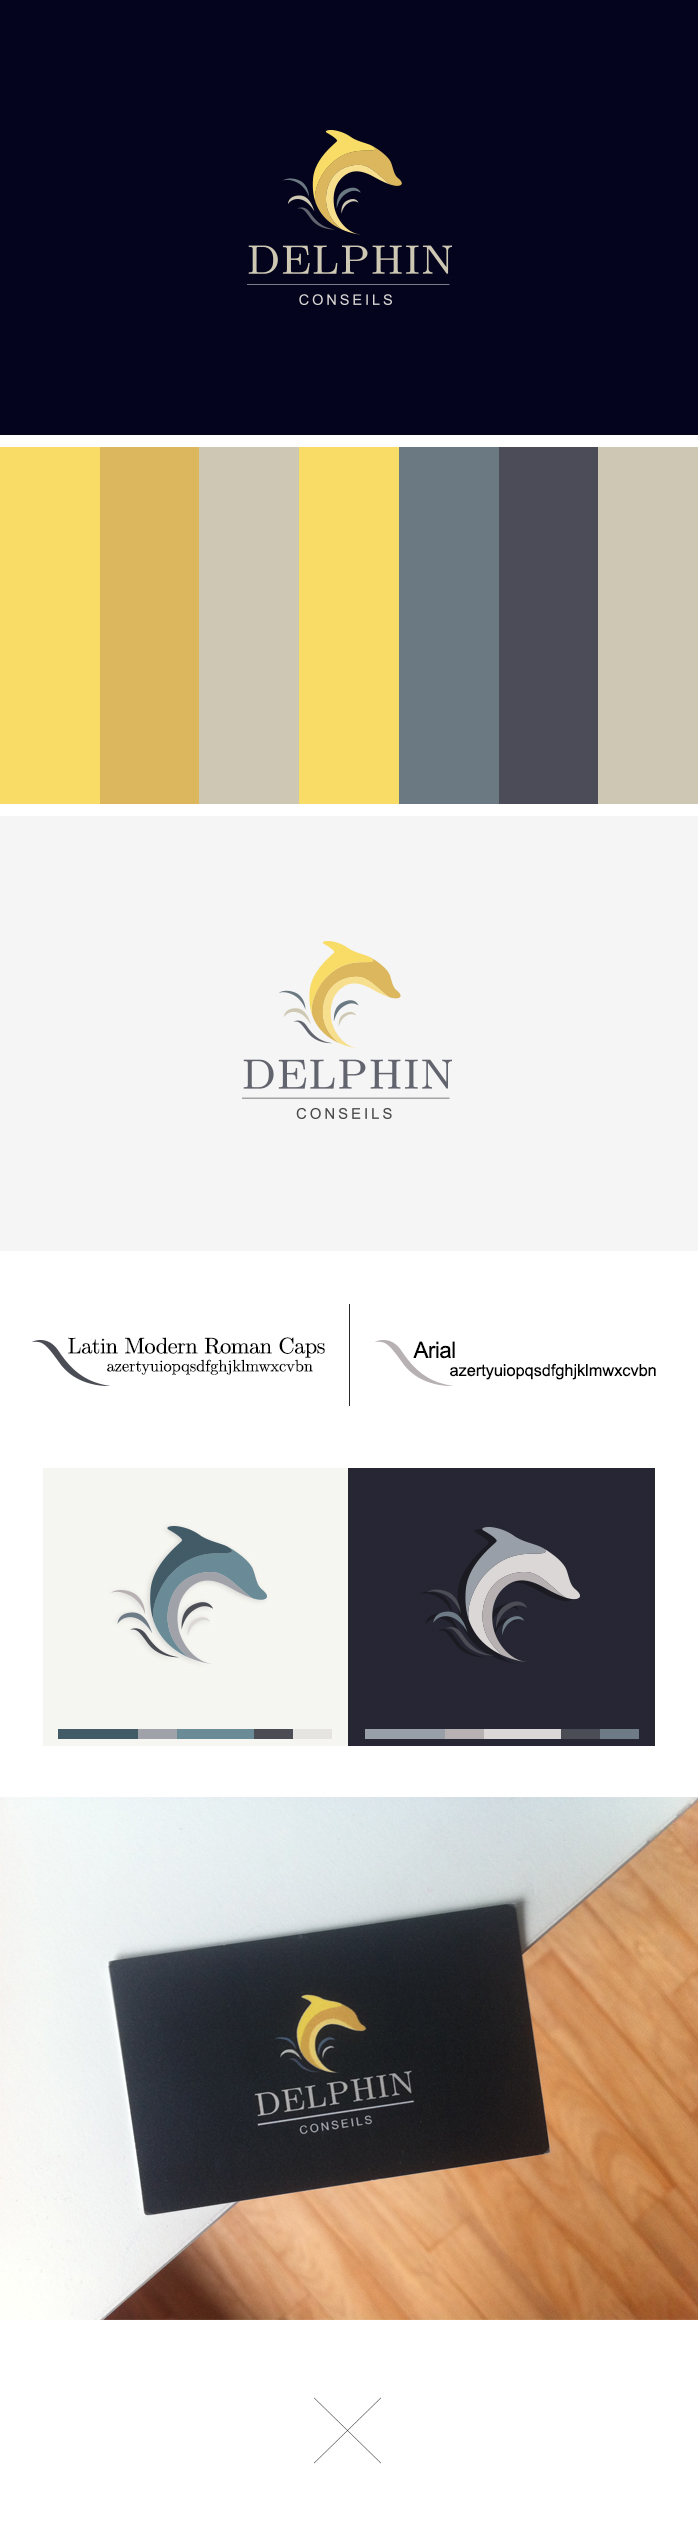 logo Delphin Conseils hotellerie